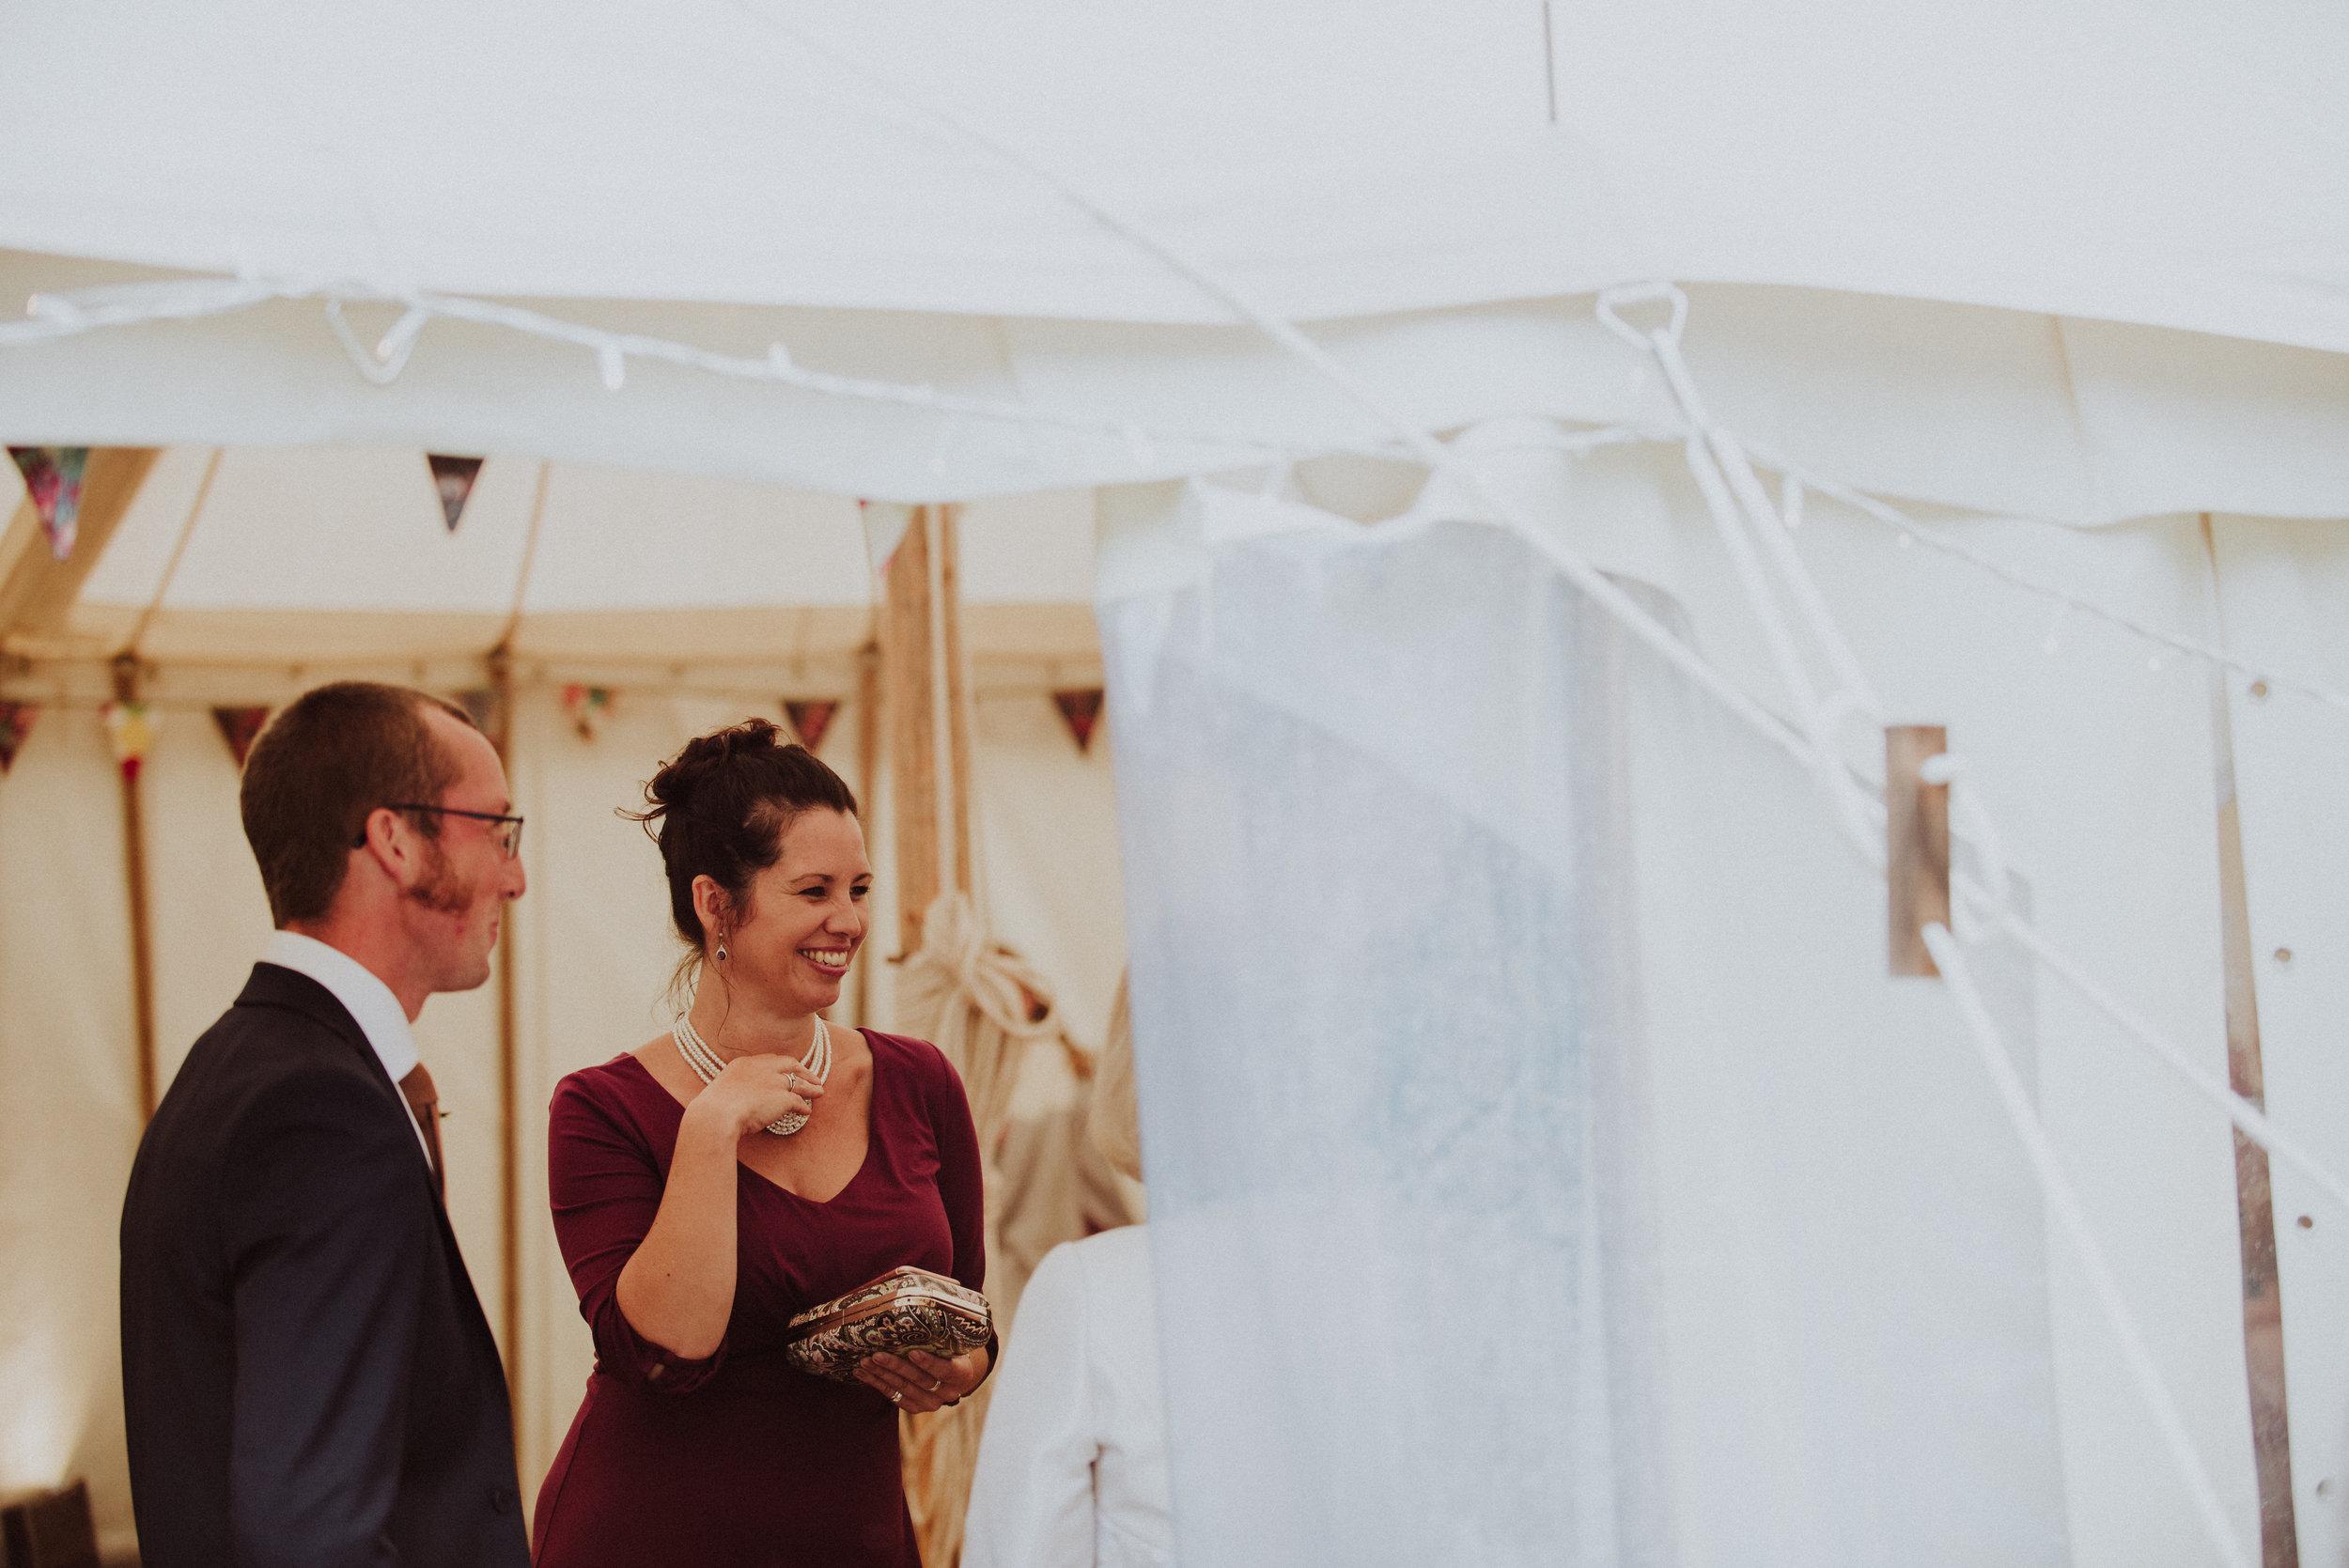 port-eliot-wedding-photographer-50.jpg